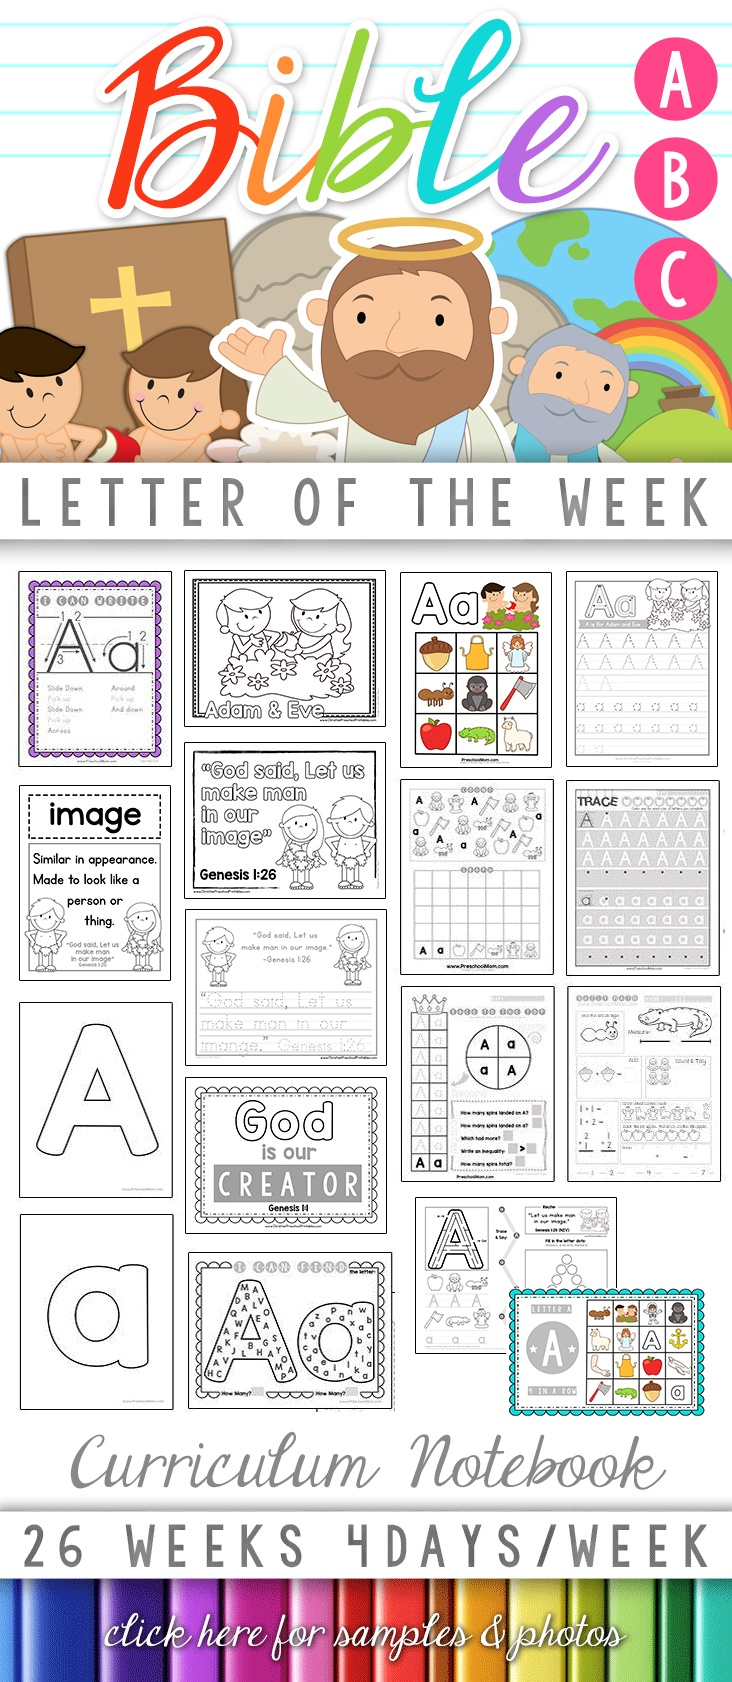 Bible Abc Printables - Christian Preschool Printables - Free Printable Bible Bingo For Preschoolers